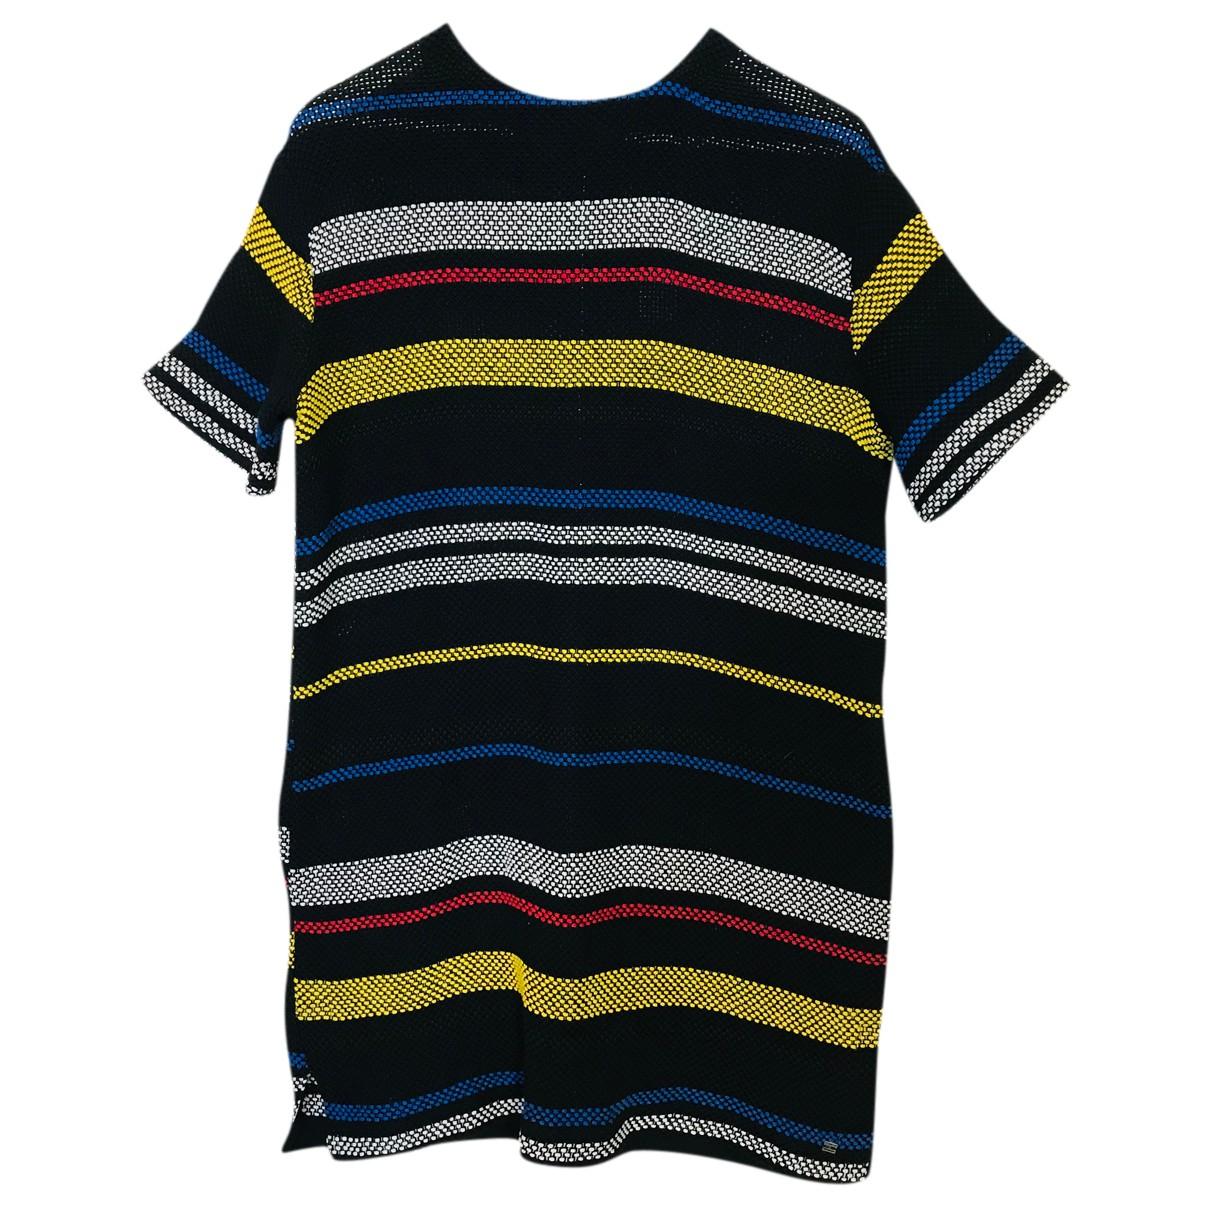 Tommy Hilfiger N Multicolour Cotton dress for Women 8 UK